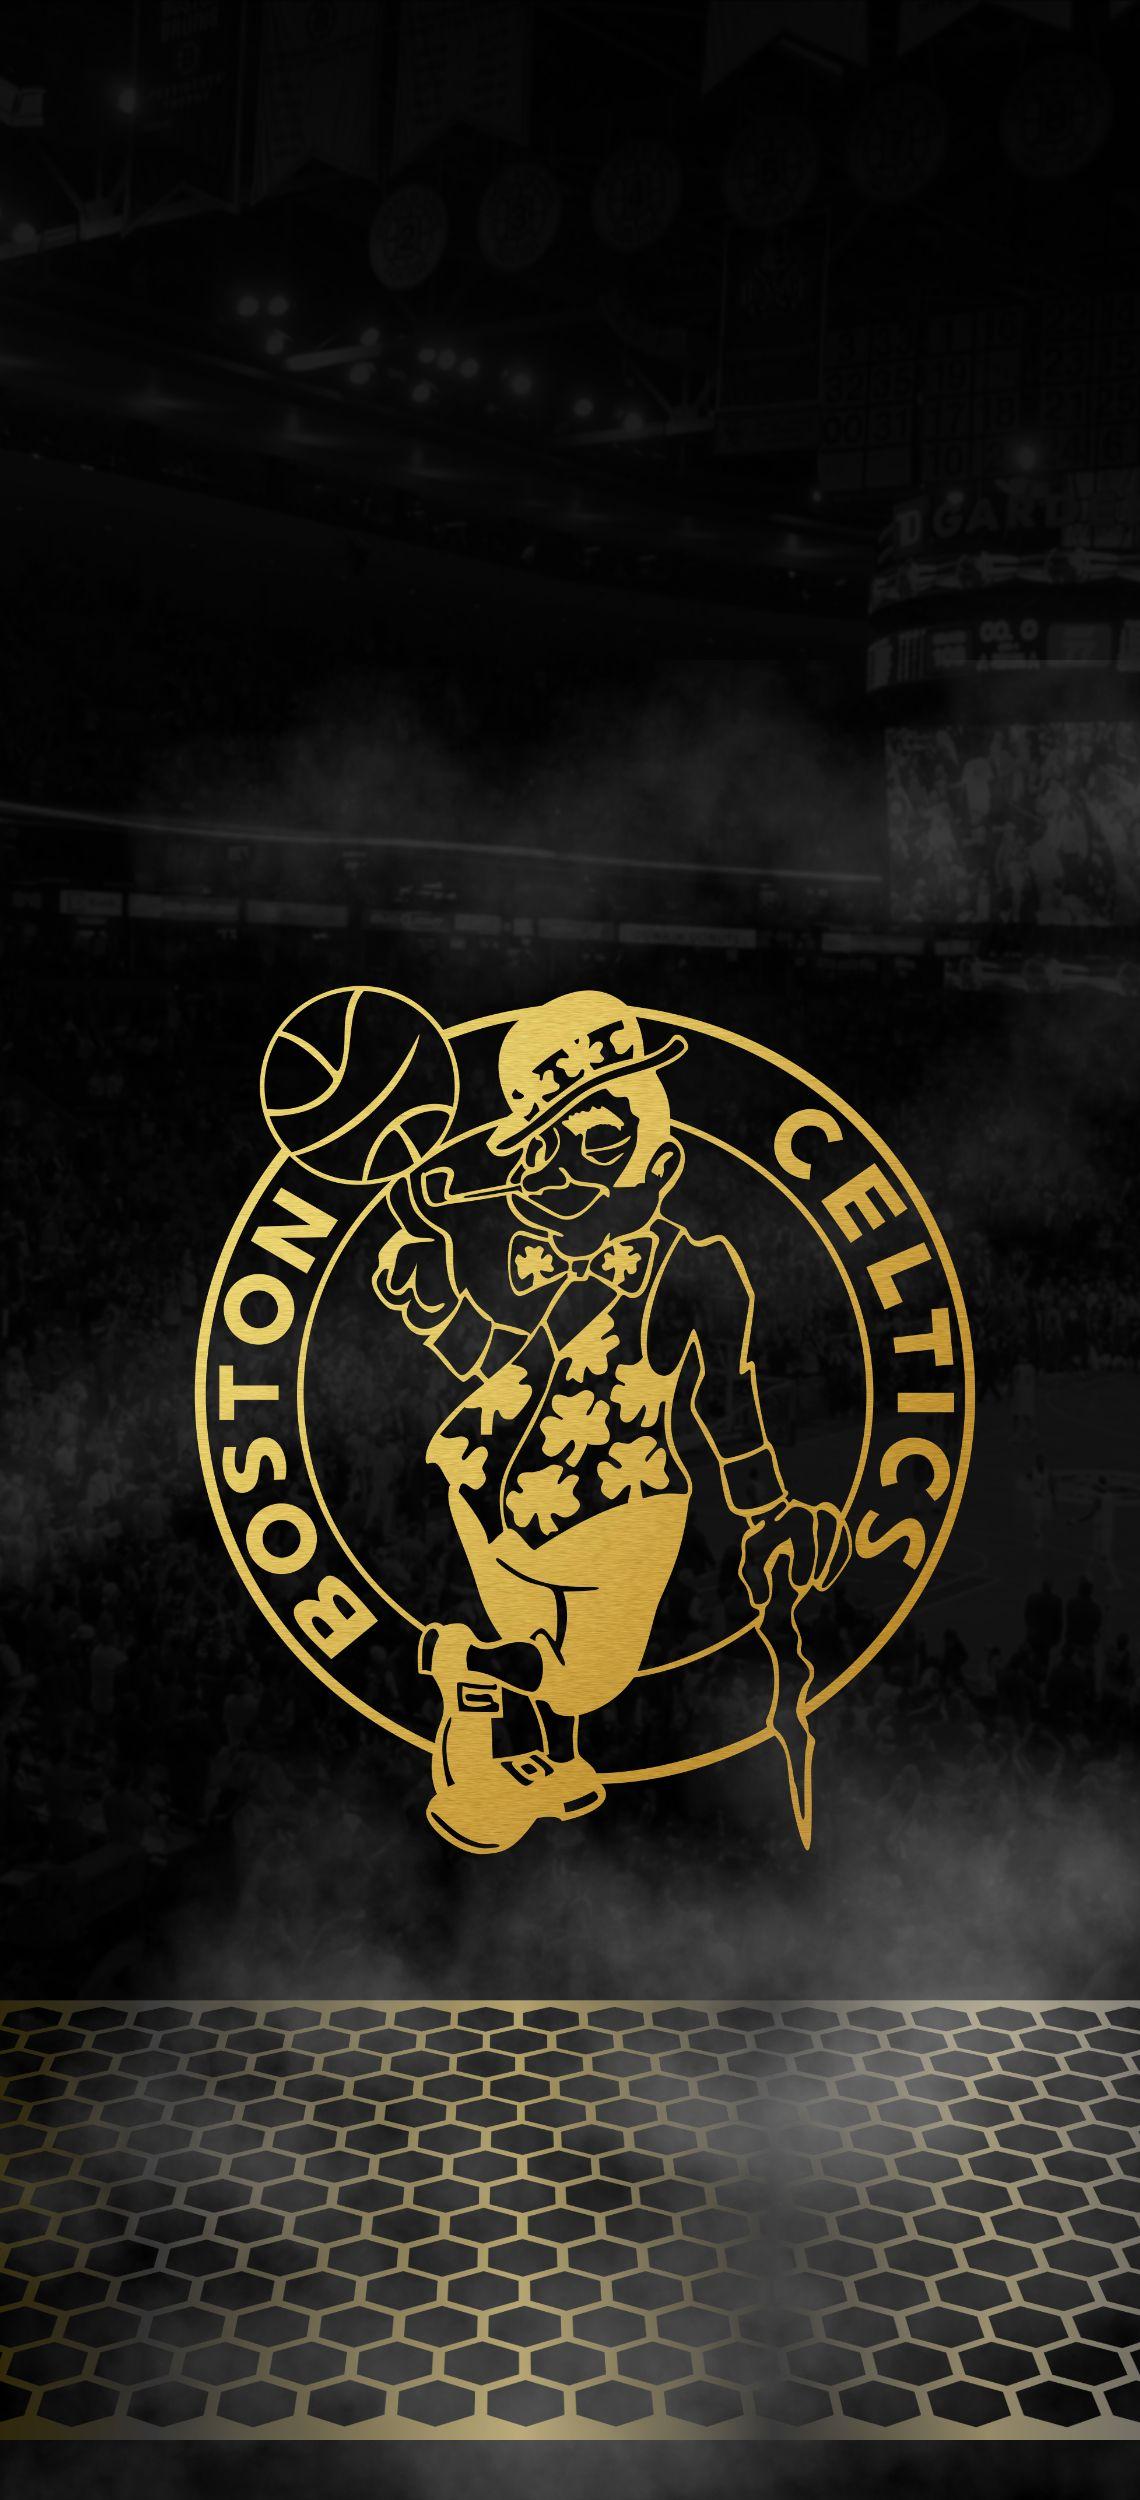 Sportsign Shop Redbubble Boston Celtics Wallpaper Boston Celtics Basketball Wallpaper